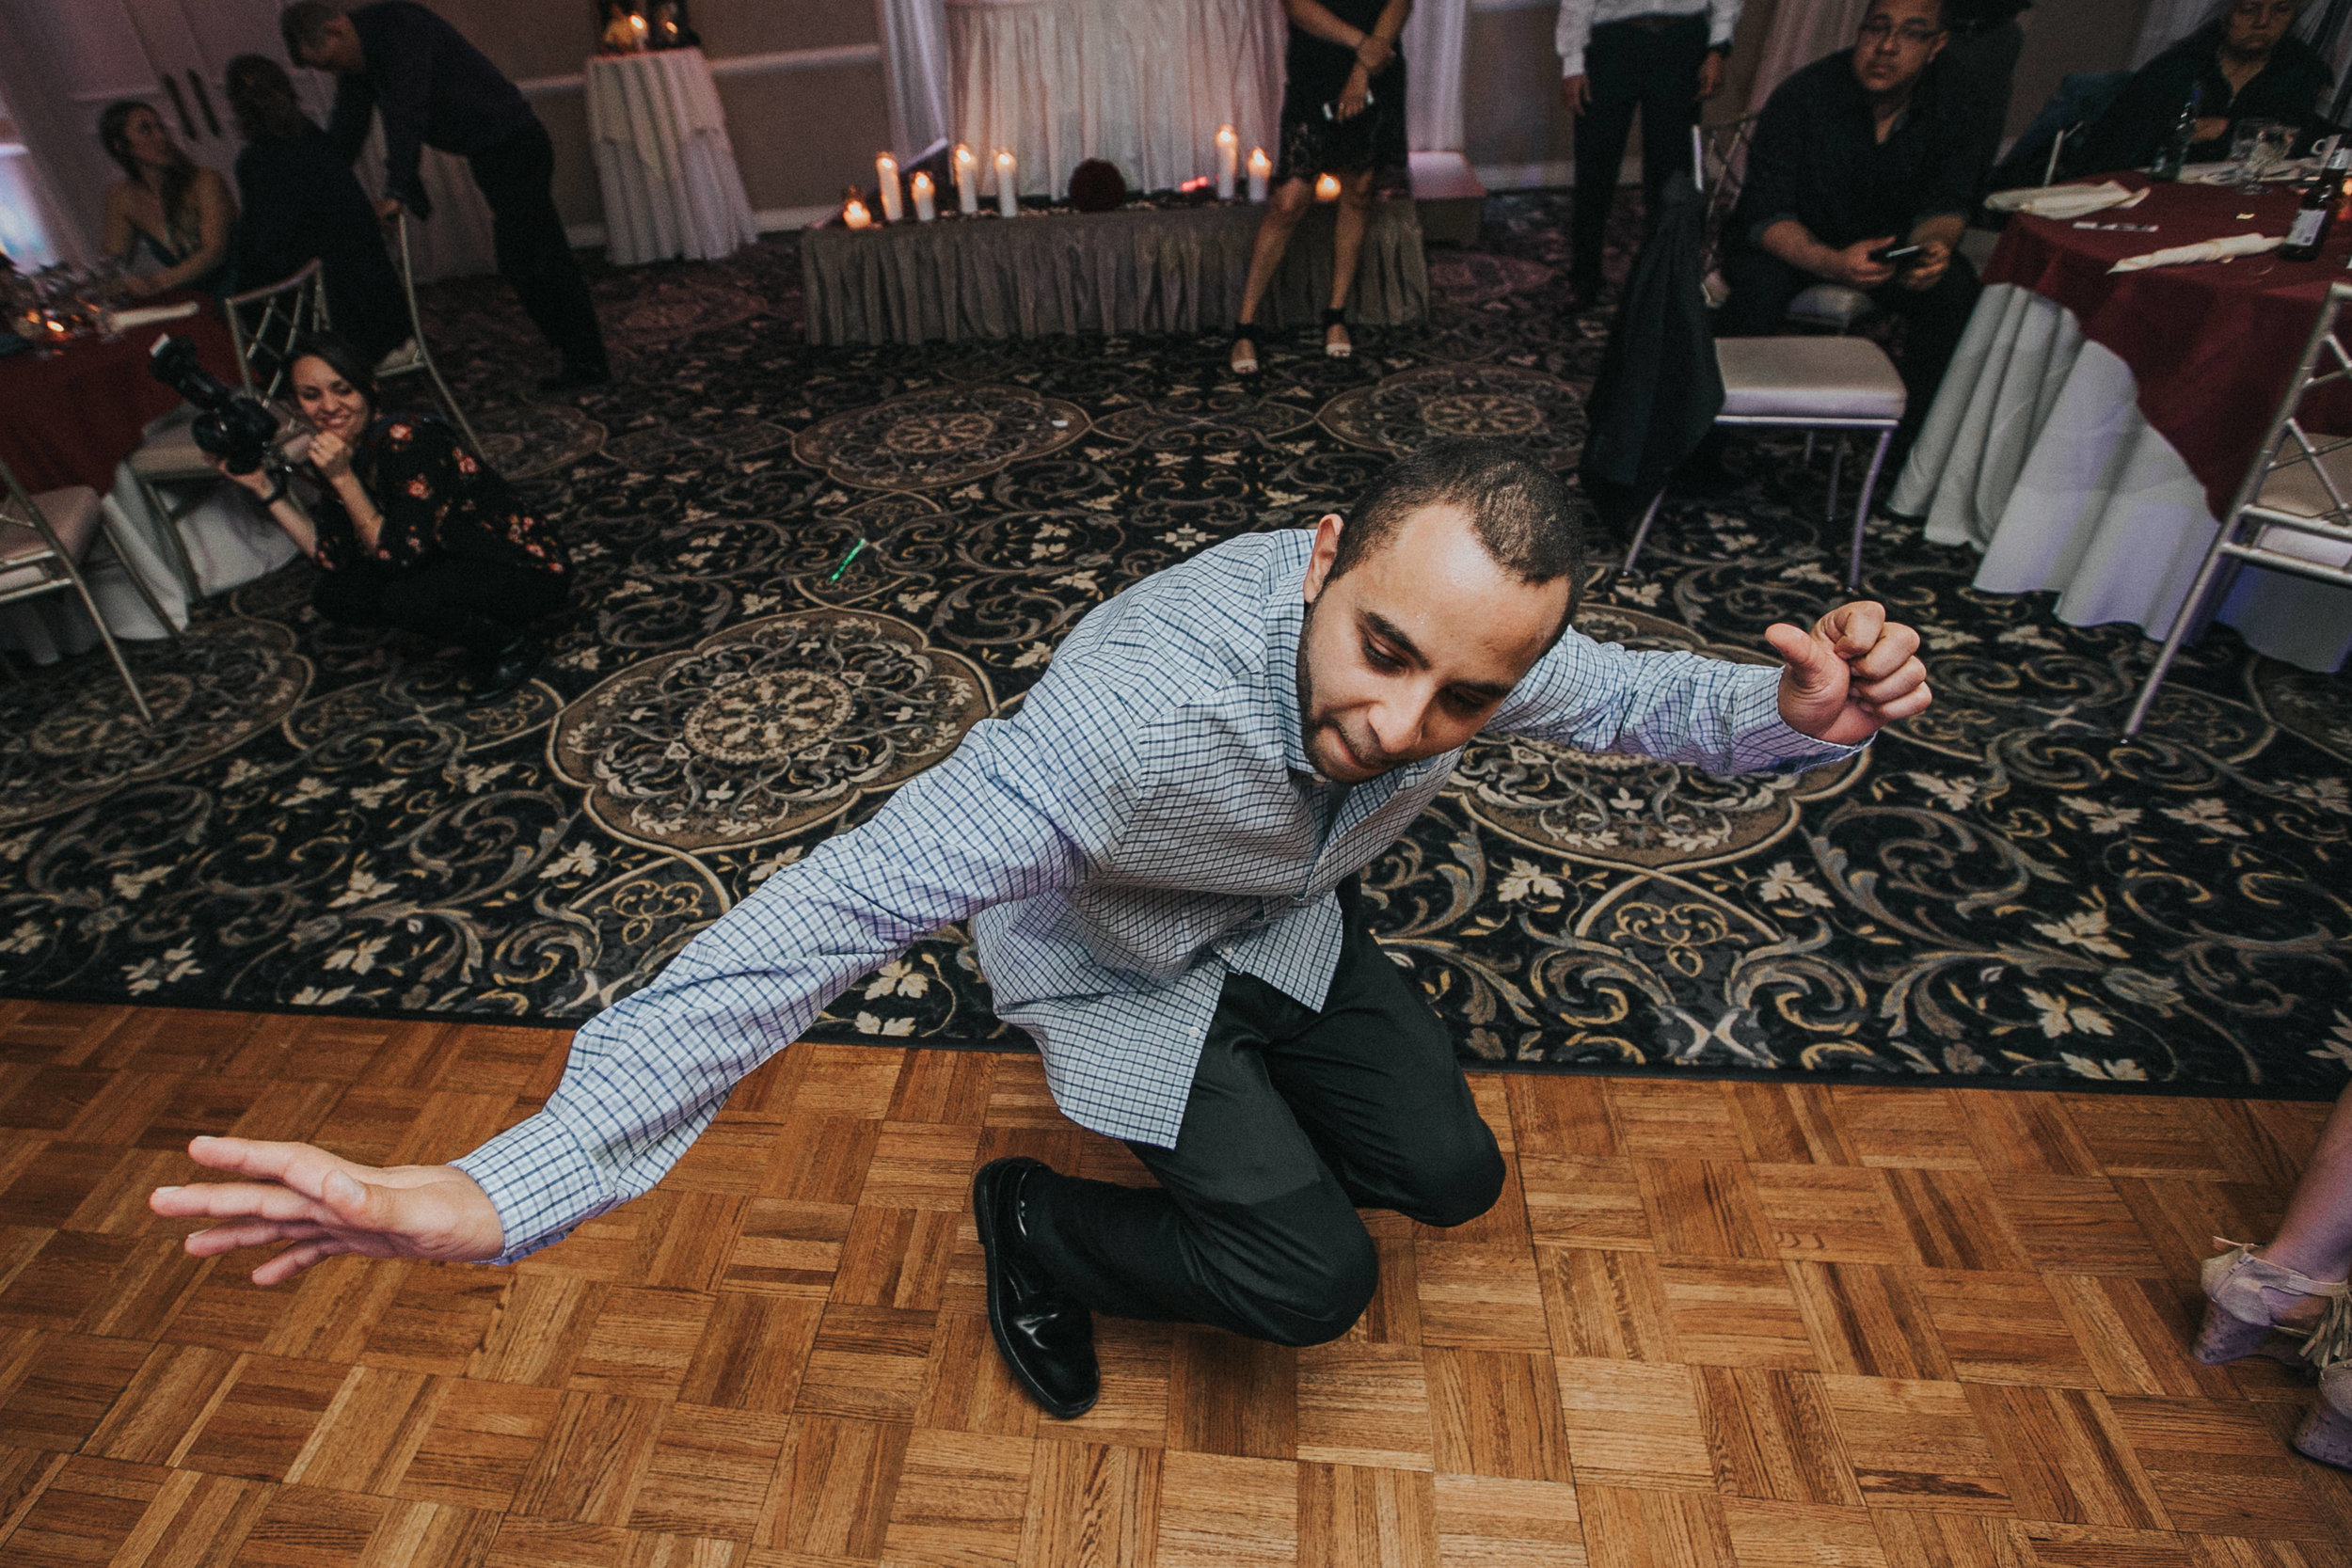 New-Jersey-Wedding-Photographer-ReceptionCenter-Valeria&Mike-Reception (238 of 265).jpg